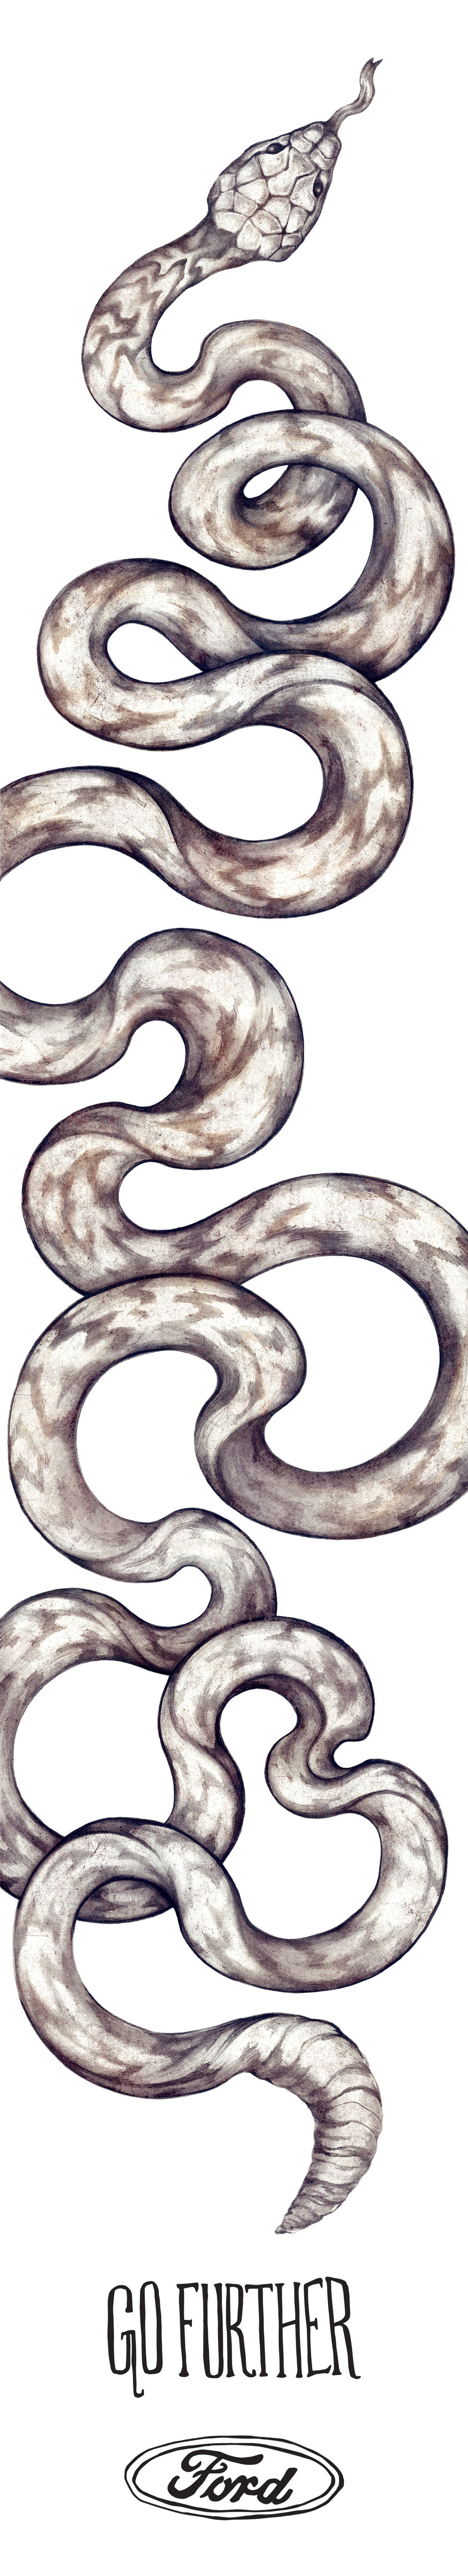 FORD_Snake_GoFurther_SM_V3_hand.jpg